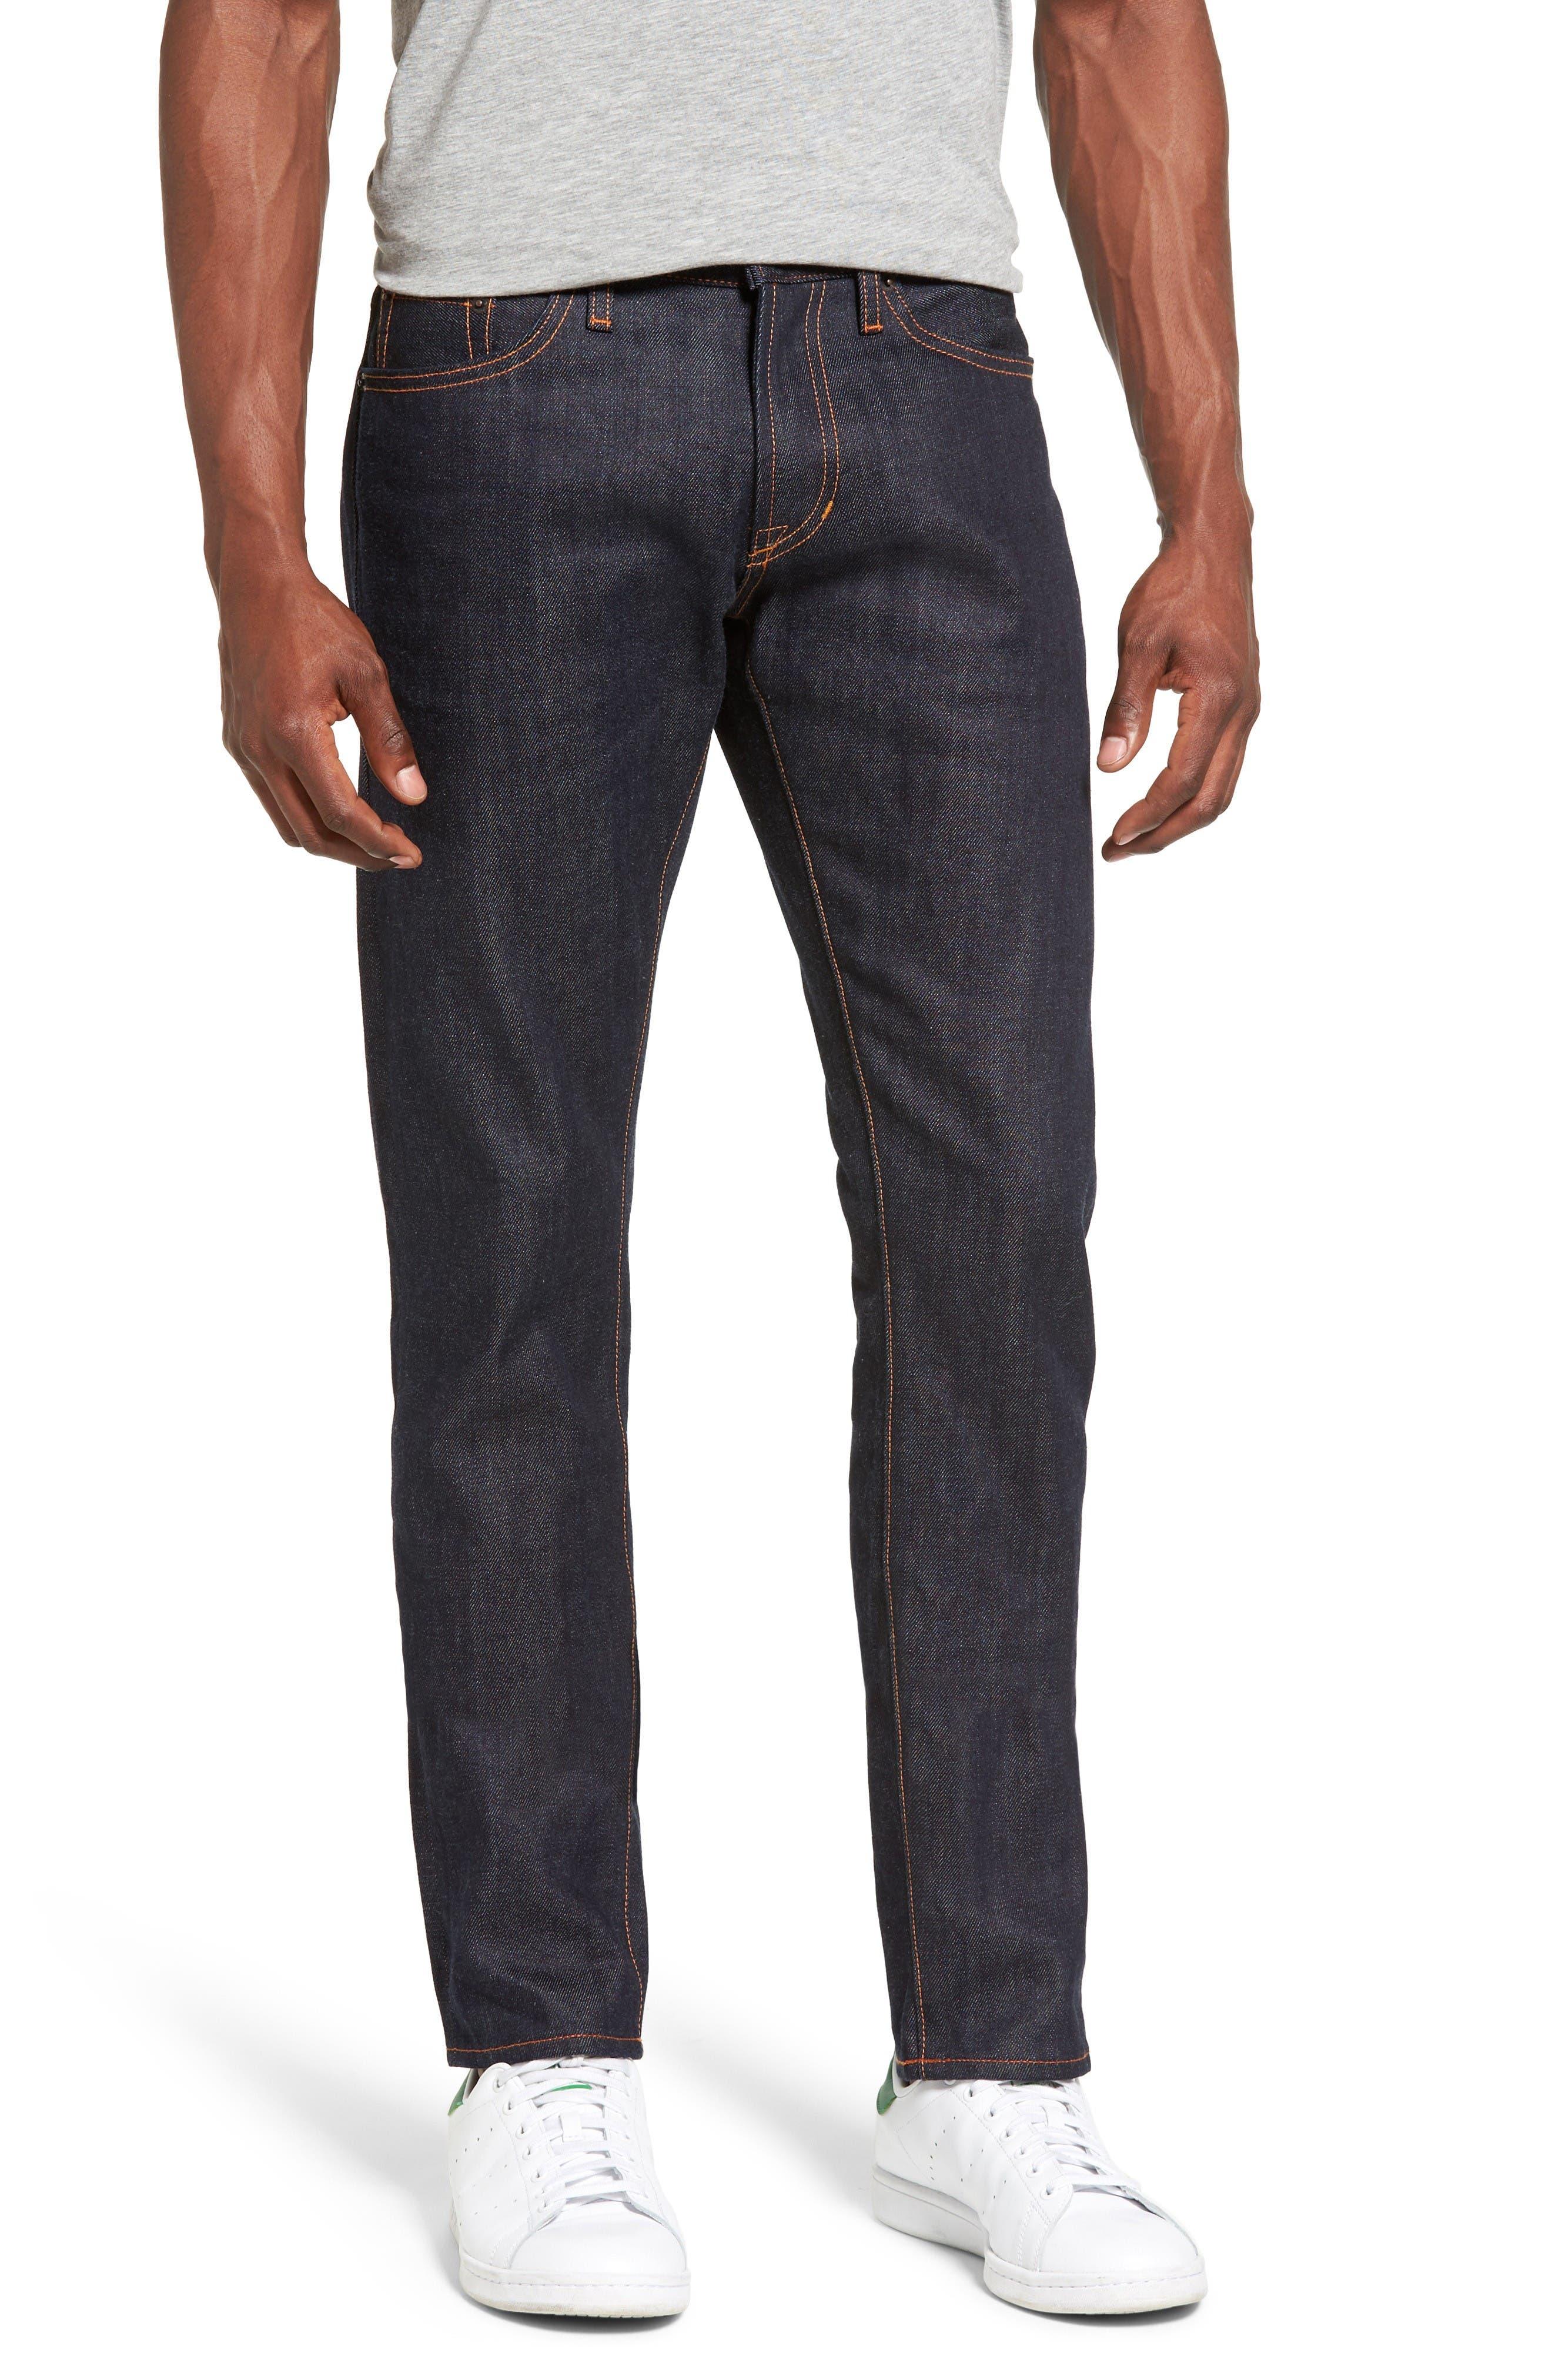 Jean Shop Jim Slim Fit Raw Selvedge Jeans (Raw) (Regular & Big)